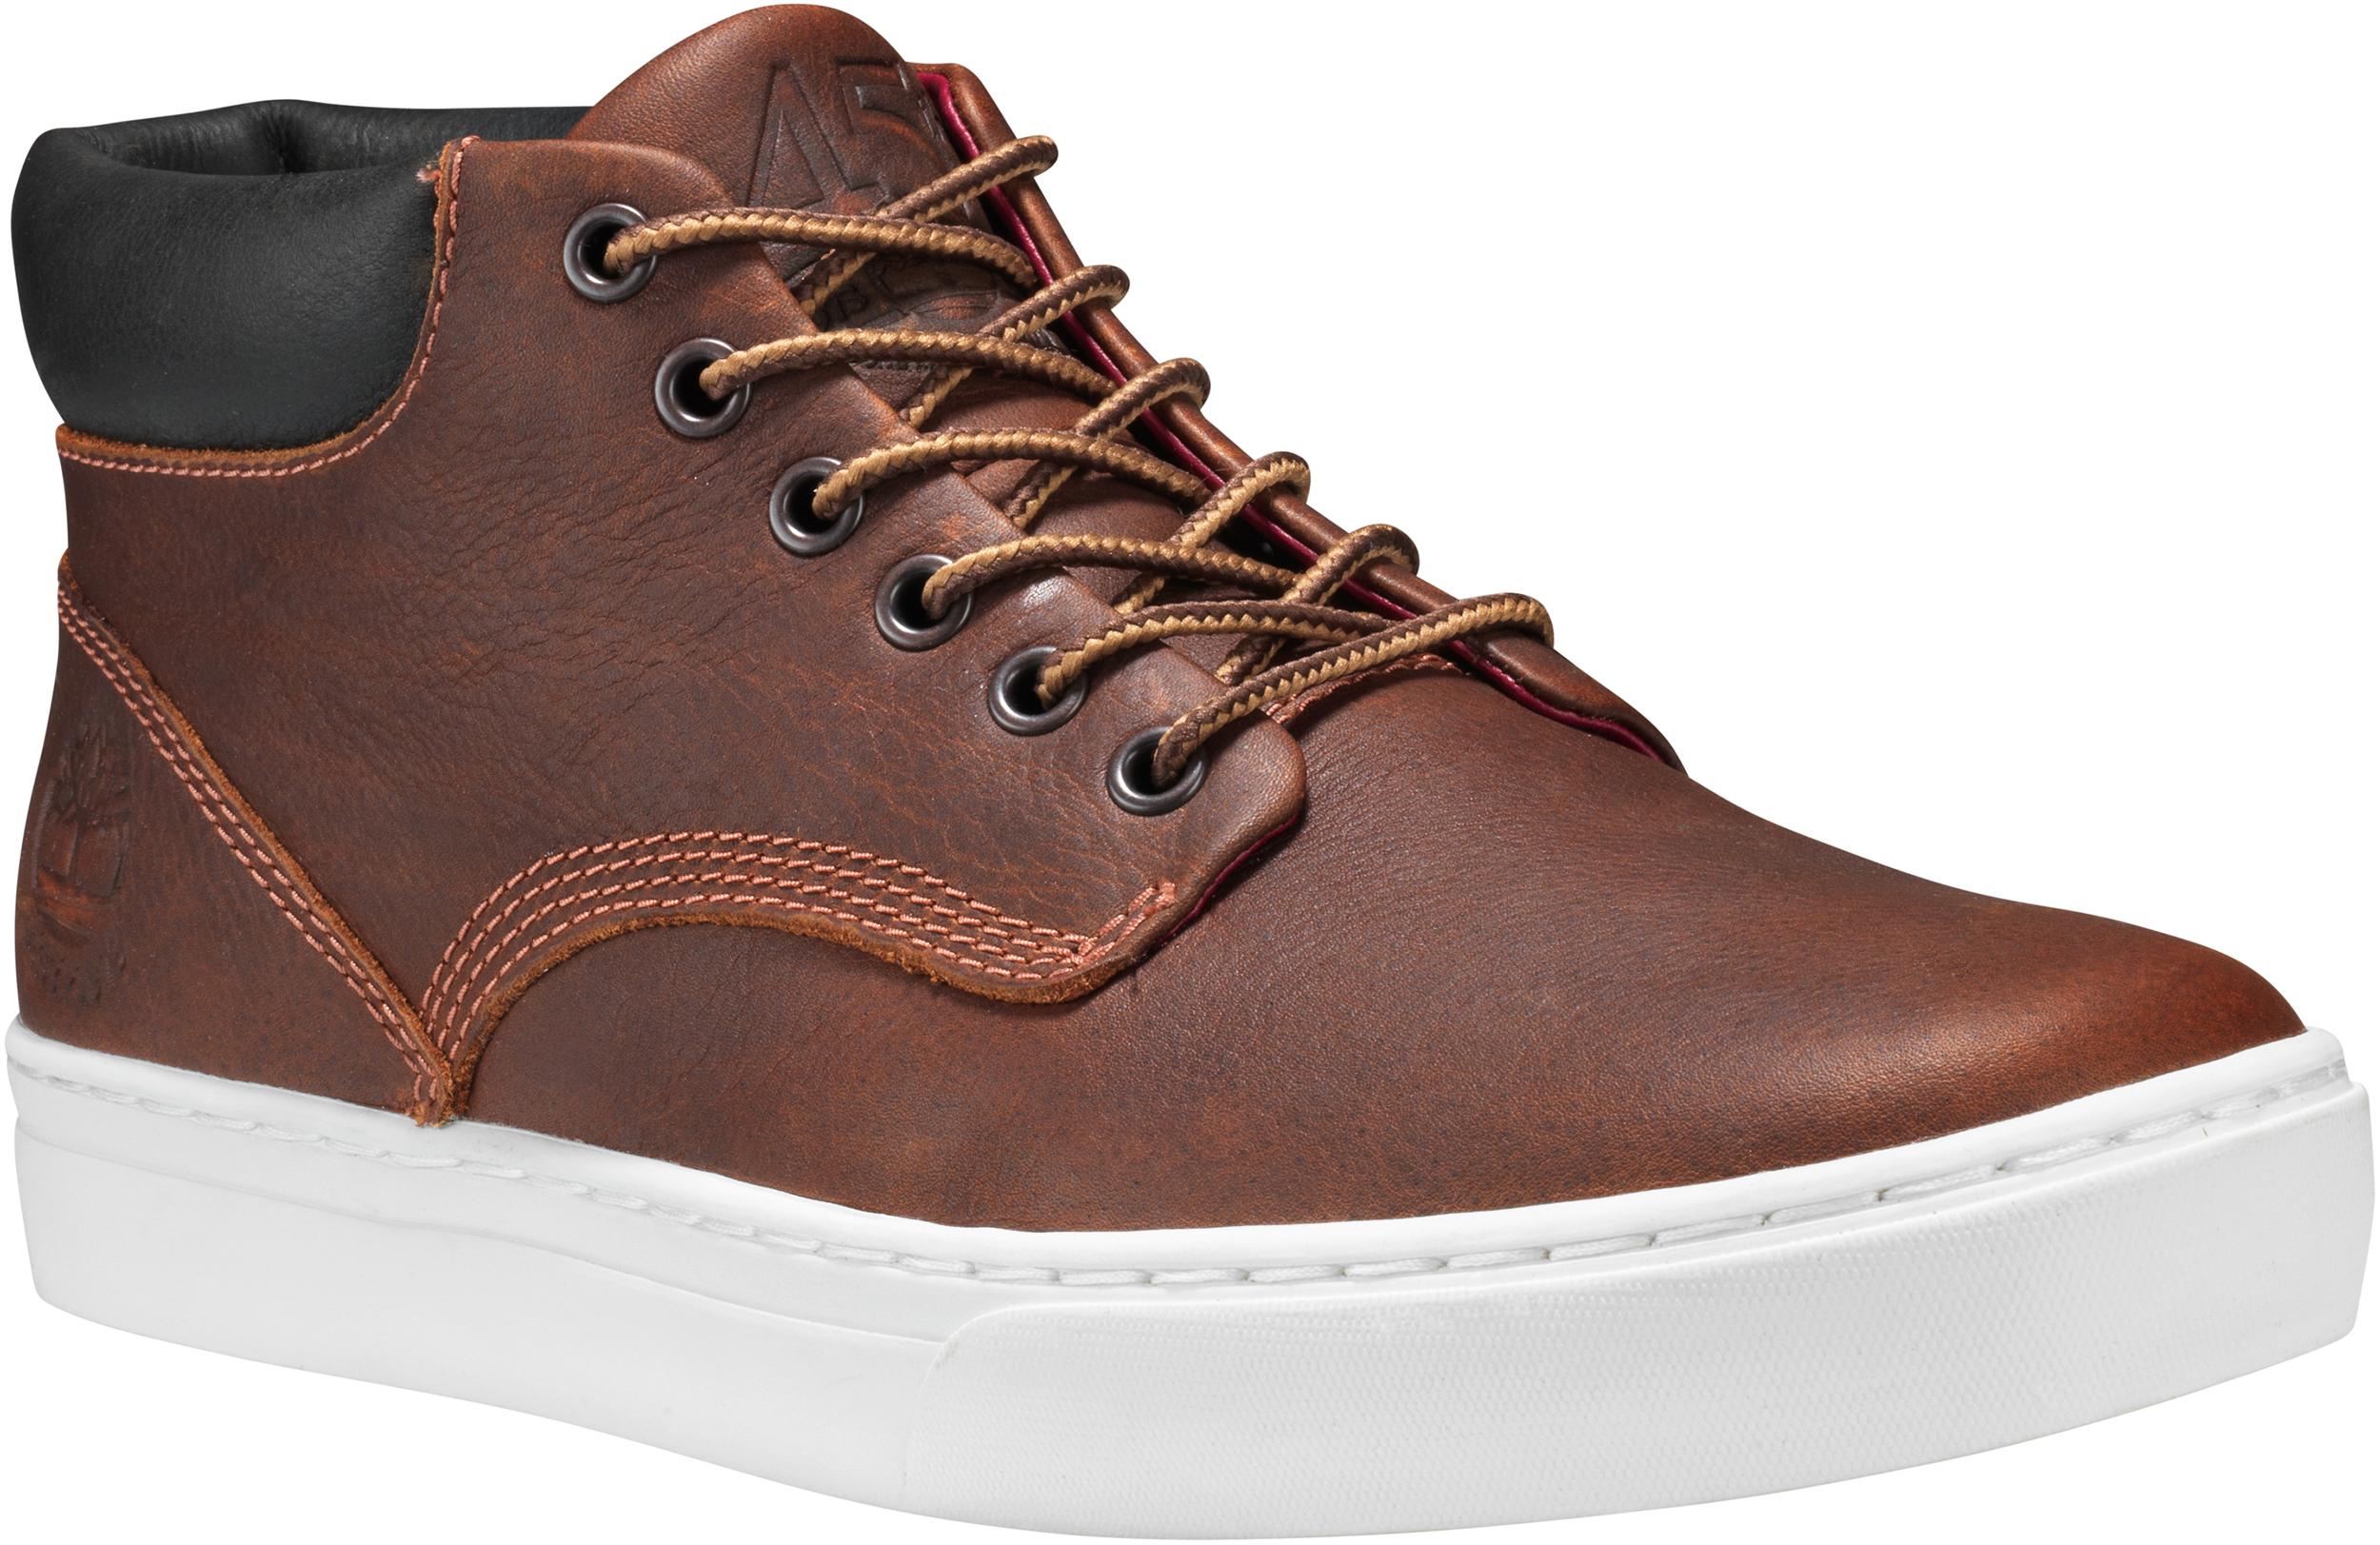 Mens Sneakers And Casual Shoes Sepatu Pria Branded Maroon Ampamp Black